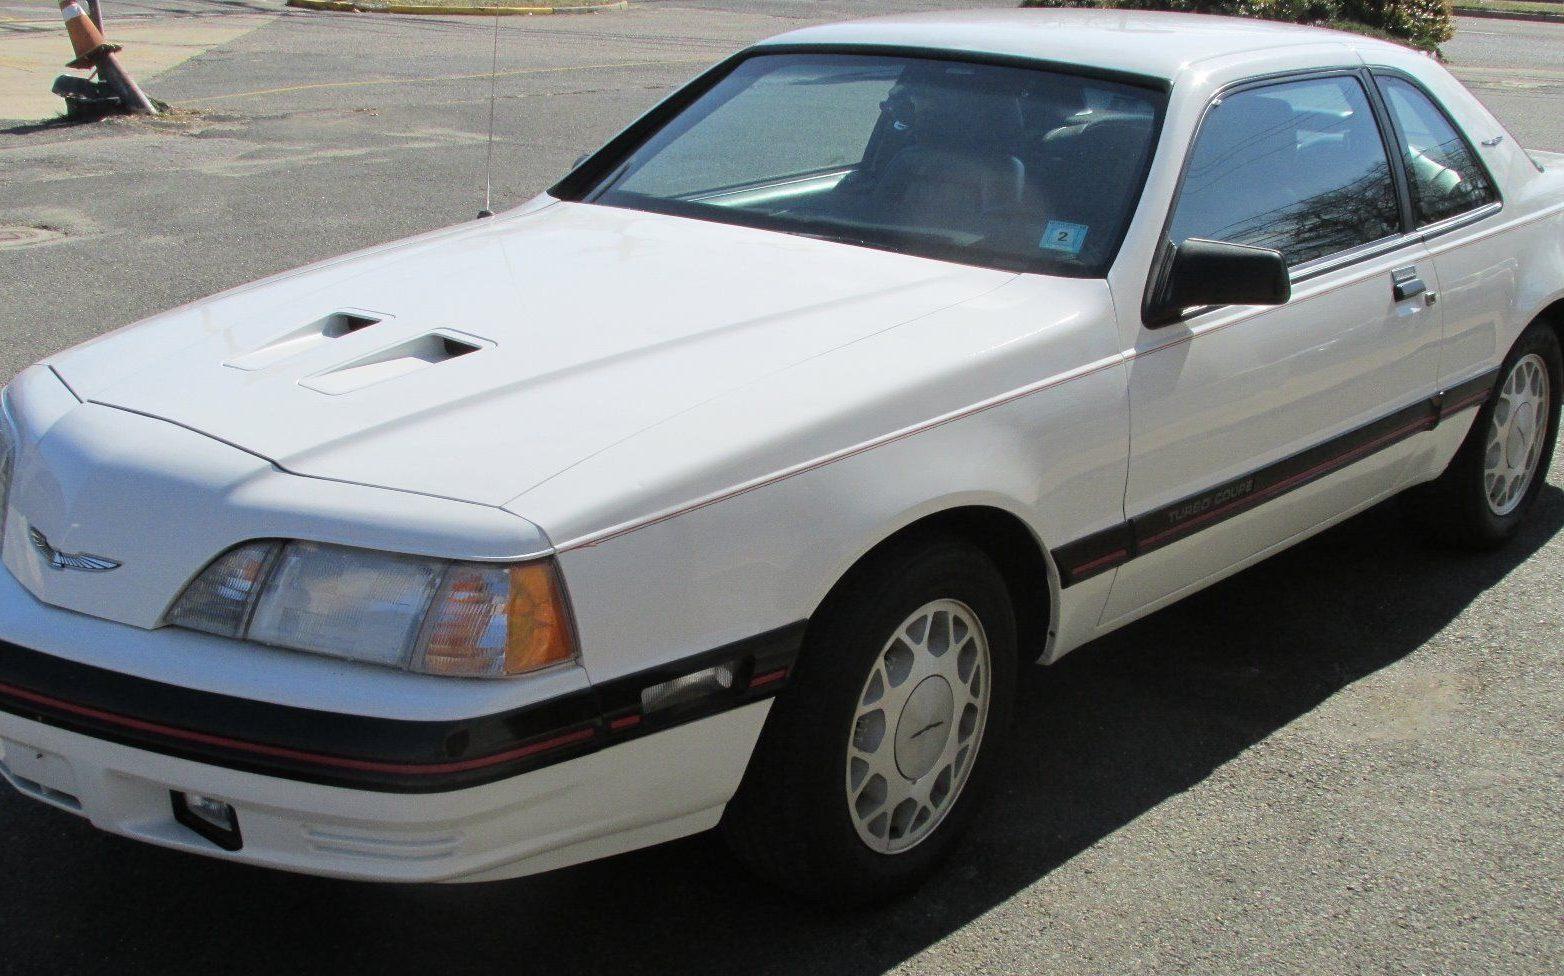 18 Year Sleep Ford Thunderbird Turbo Coupe